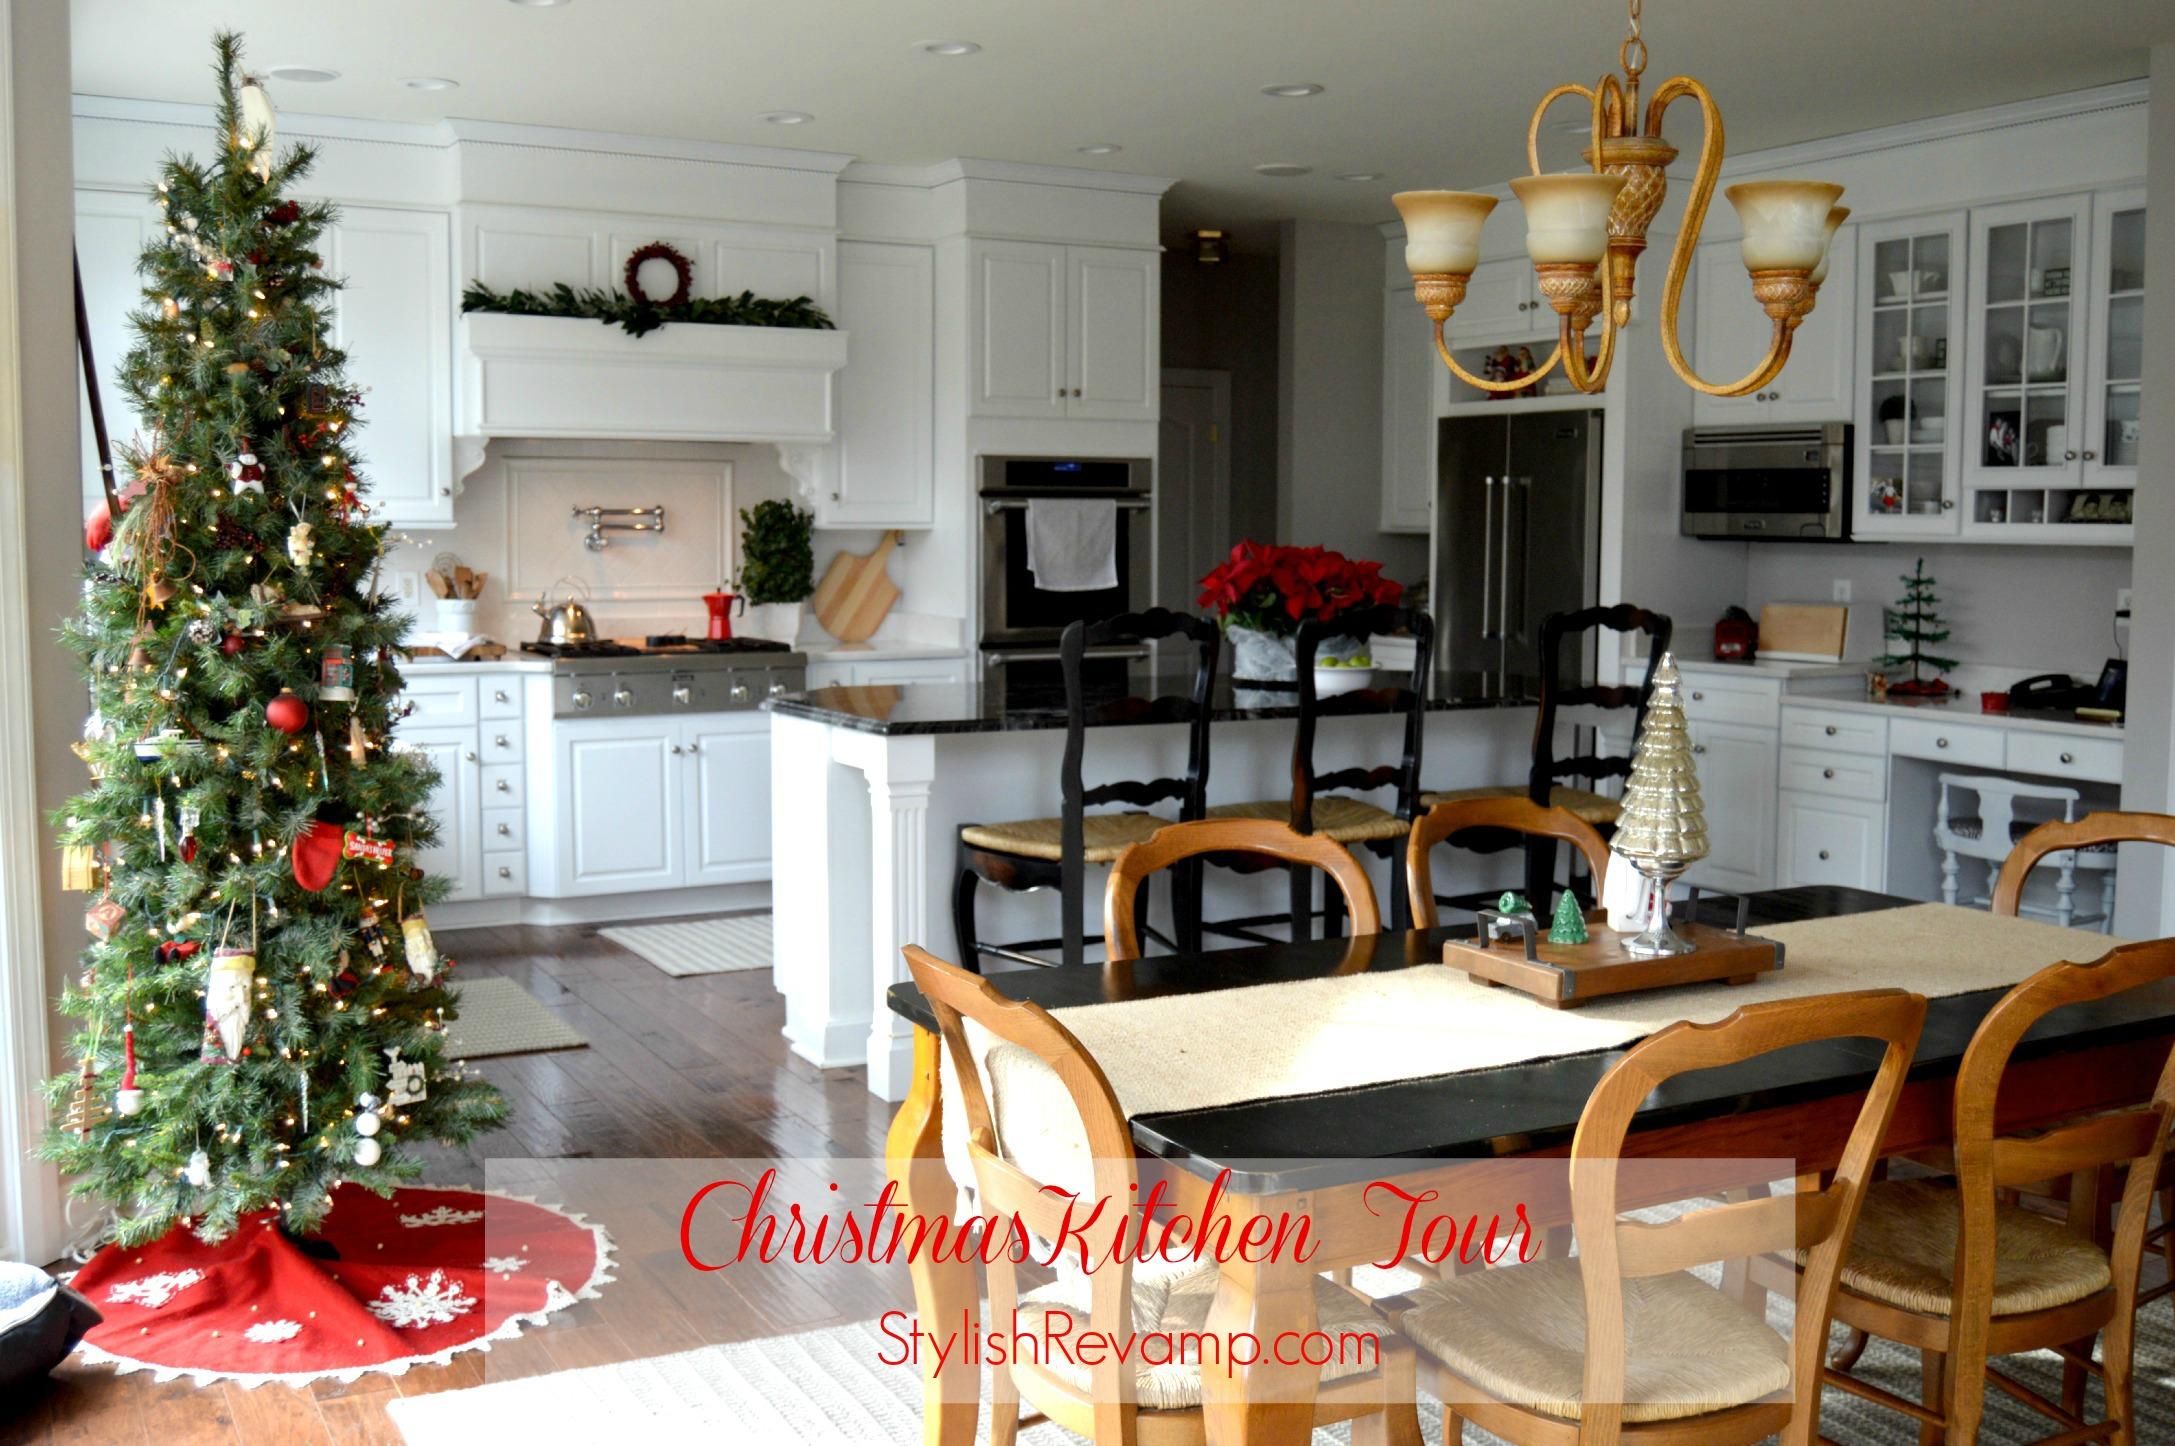 Christmas Kitchen White Kitchen Christmas Tour Stylish Revamp